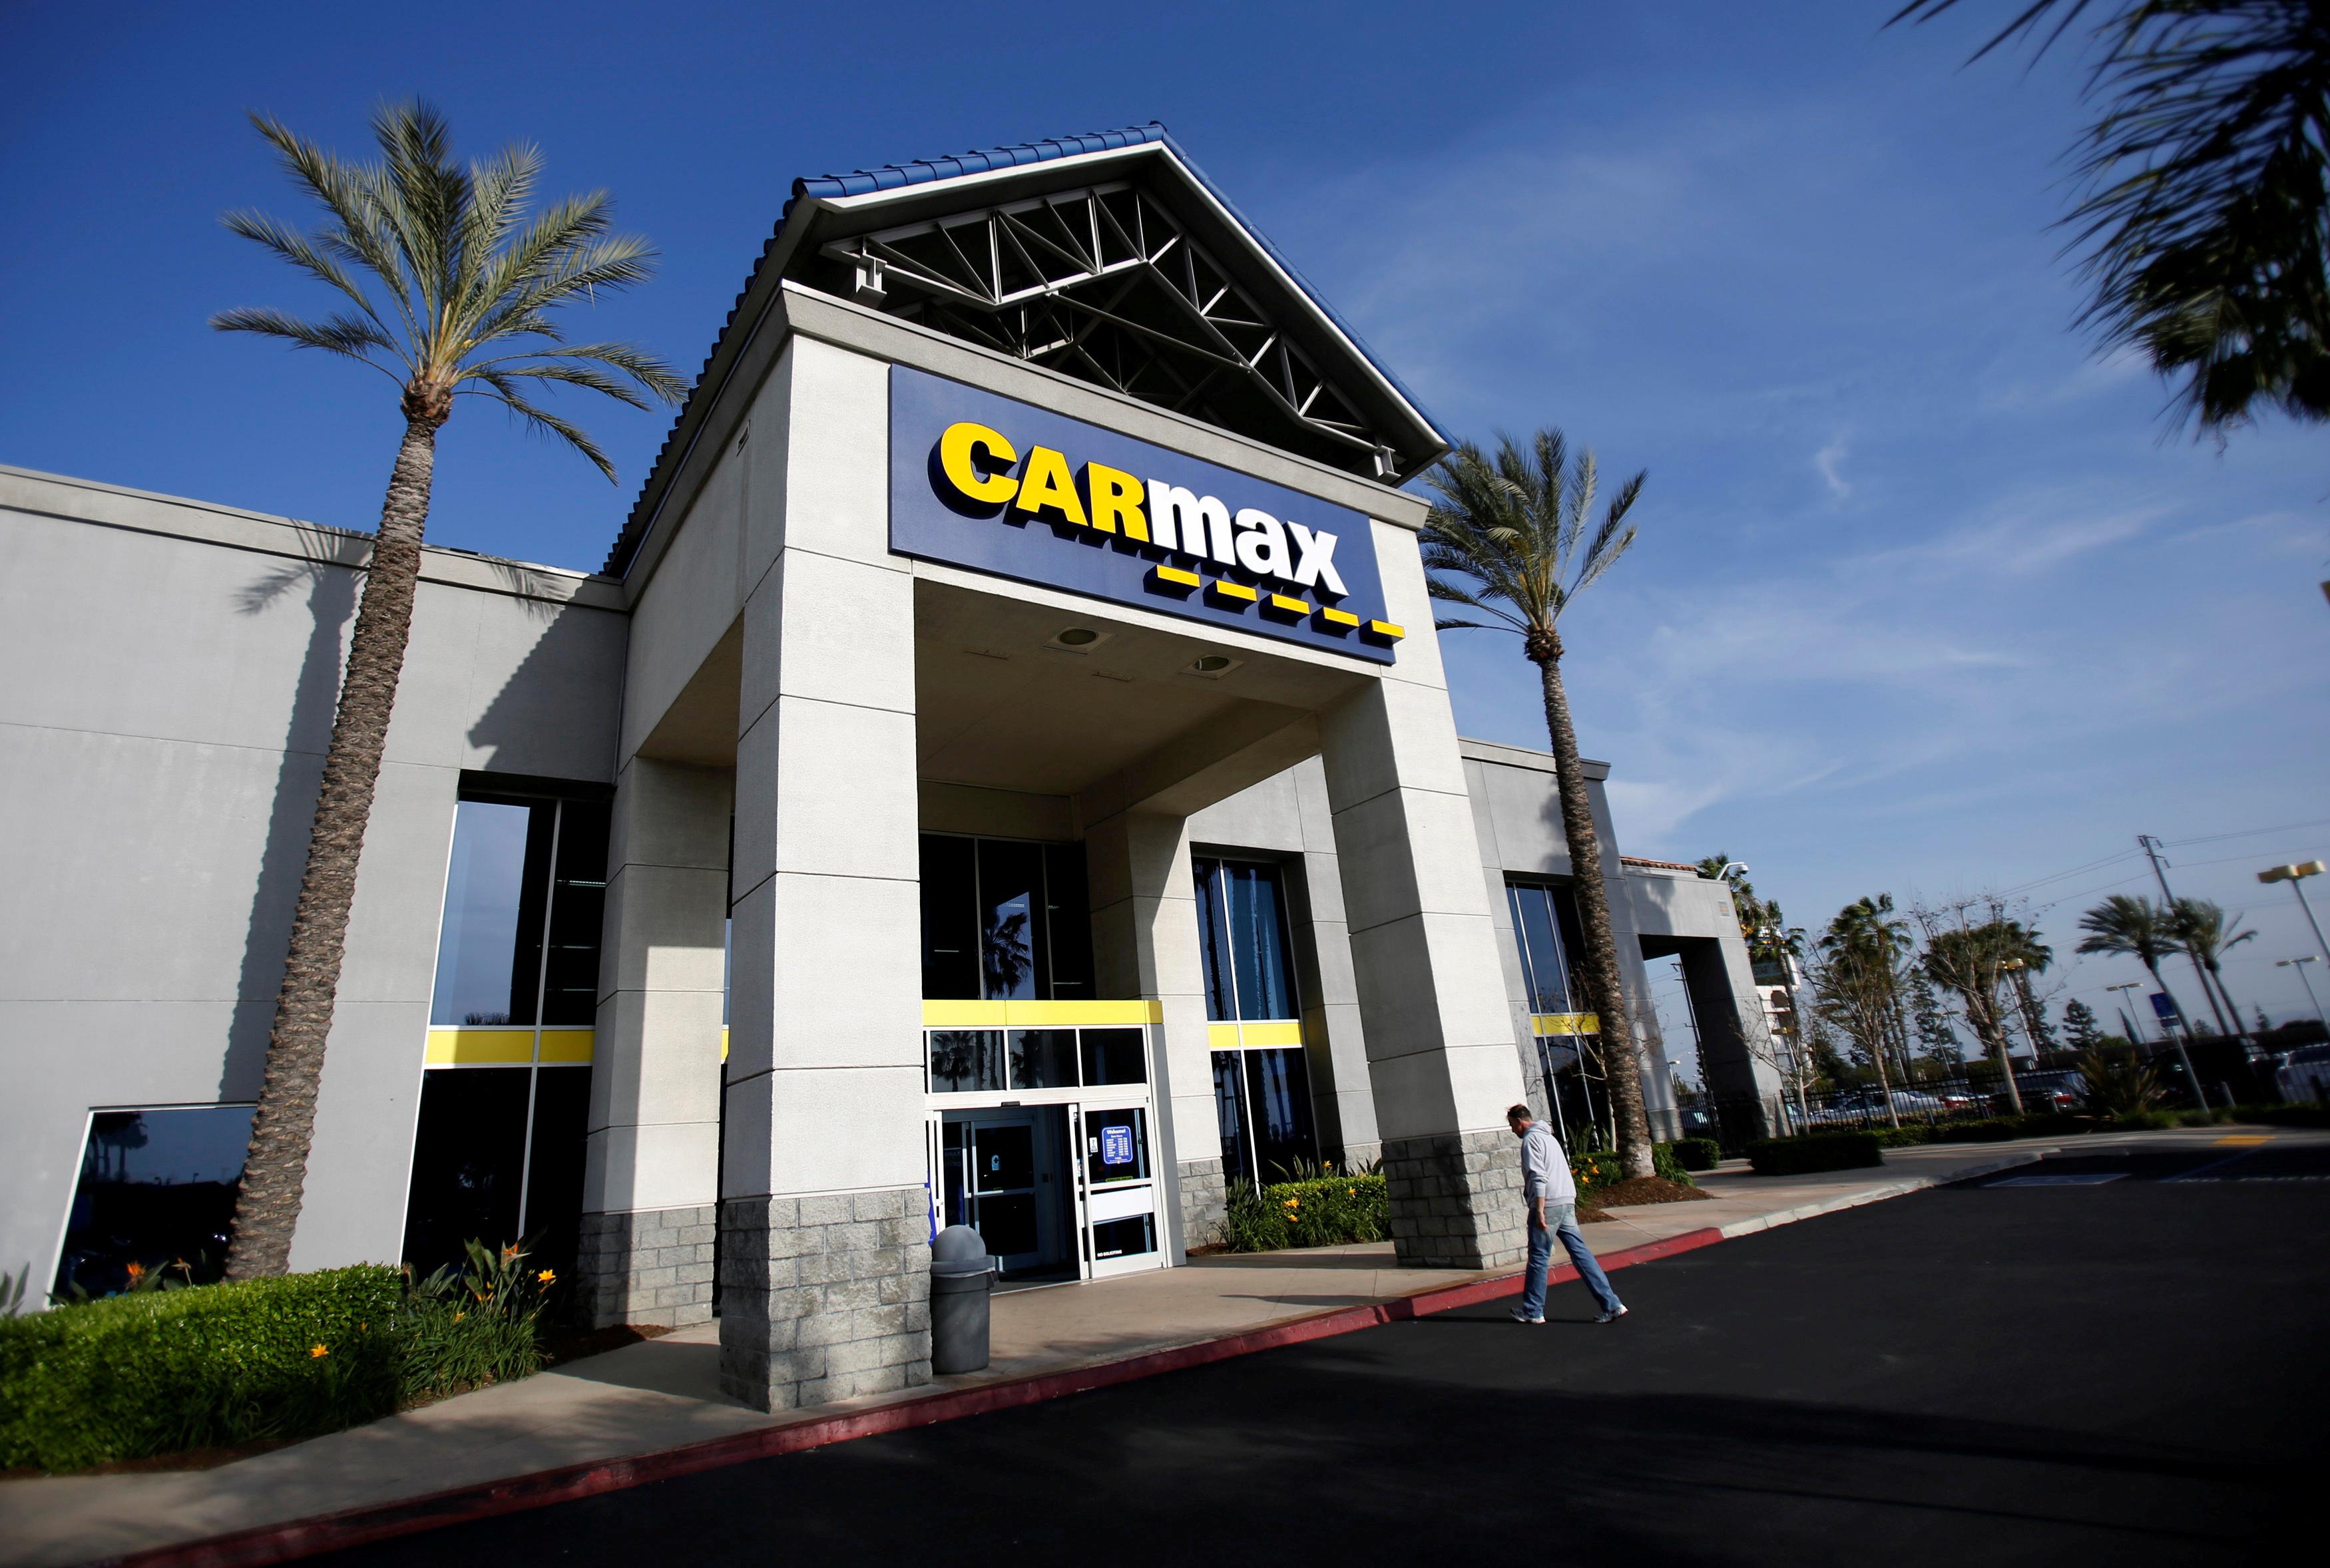 A man walks into a CarMax dealership in Duarte, California, United States March 28, 2014. REUTERS/Mario Anzuoni